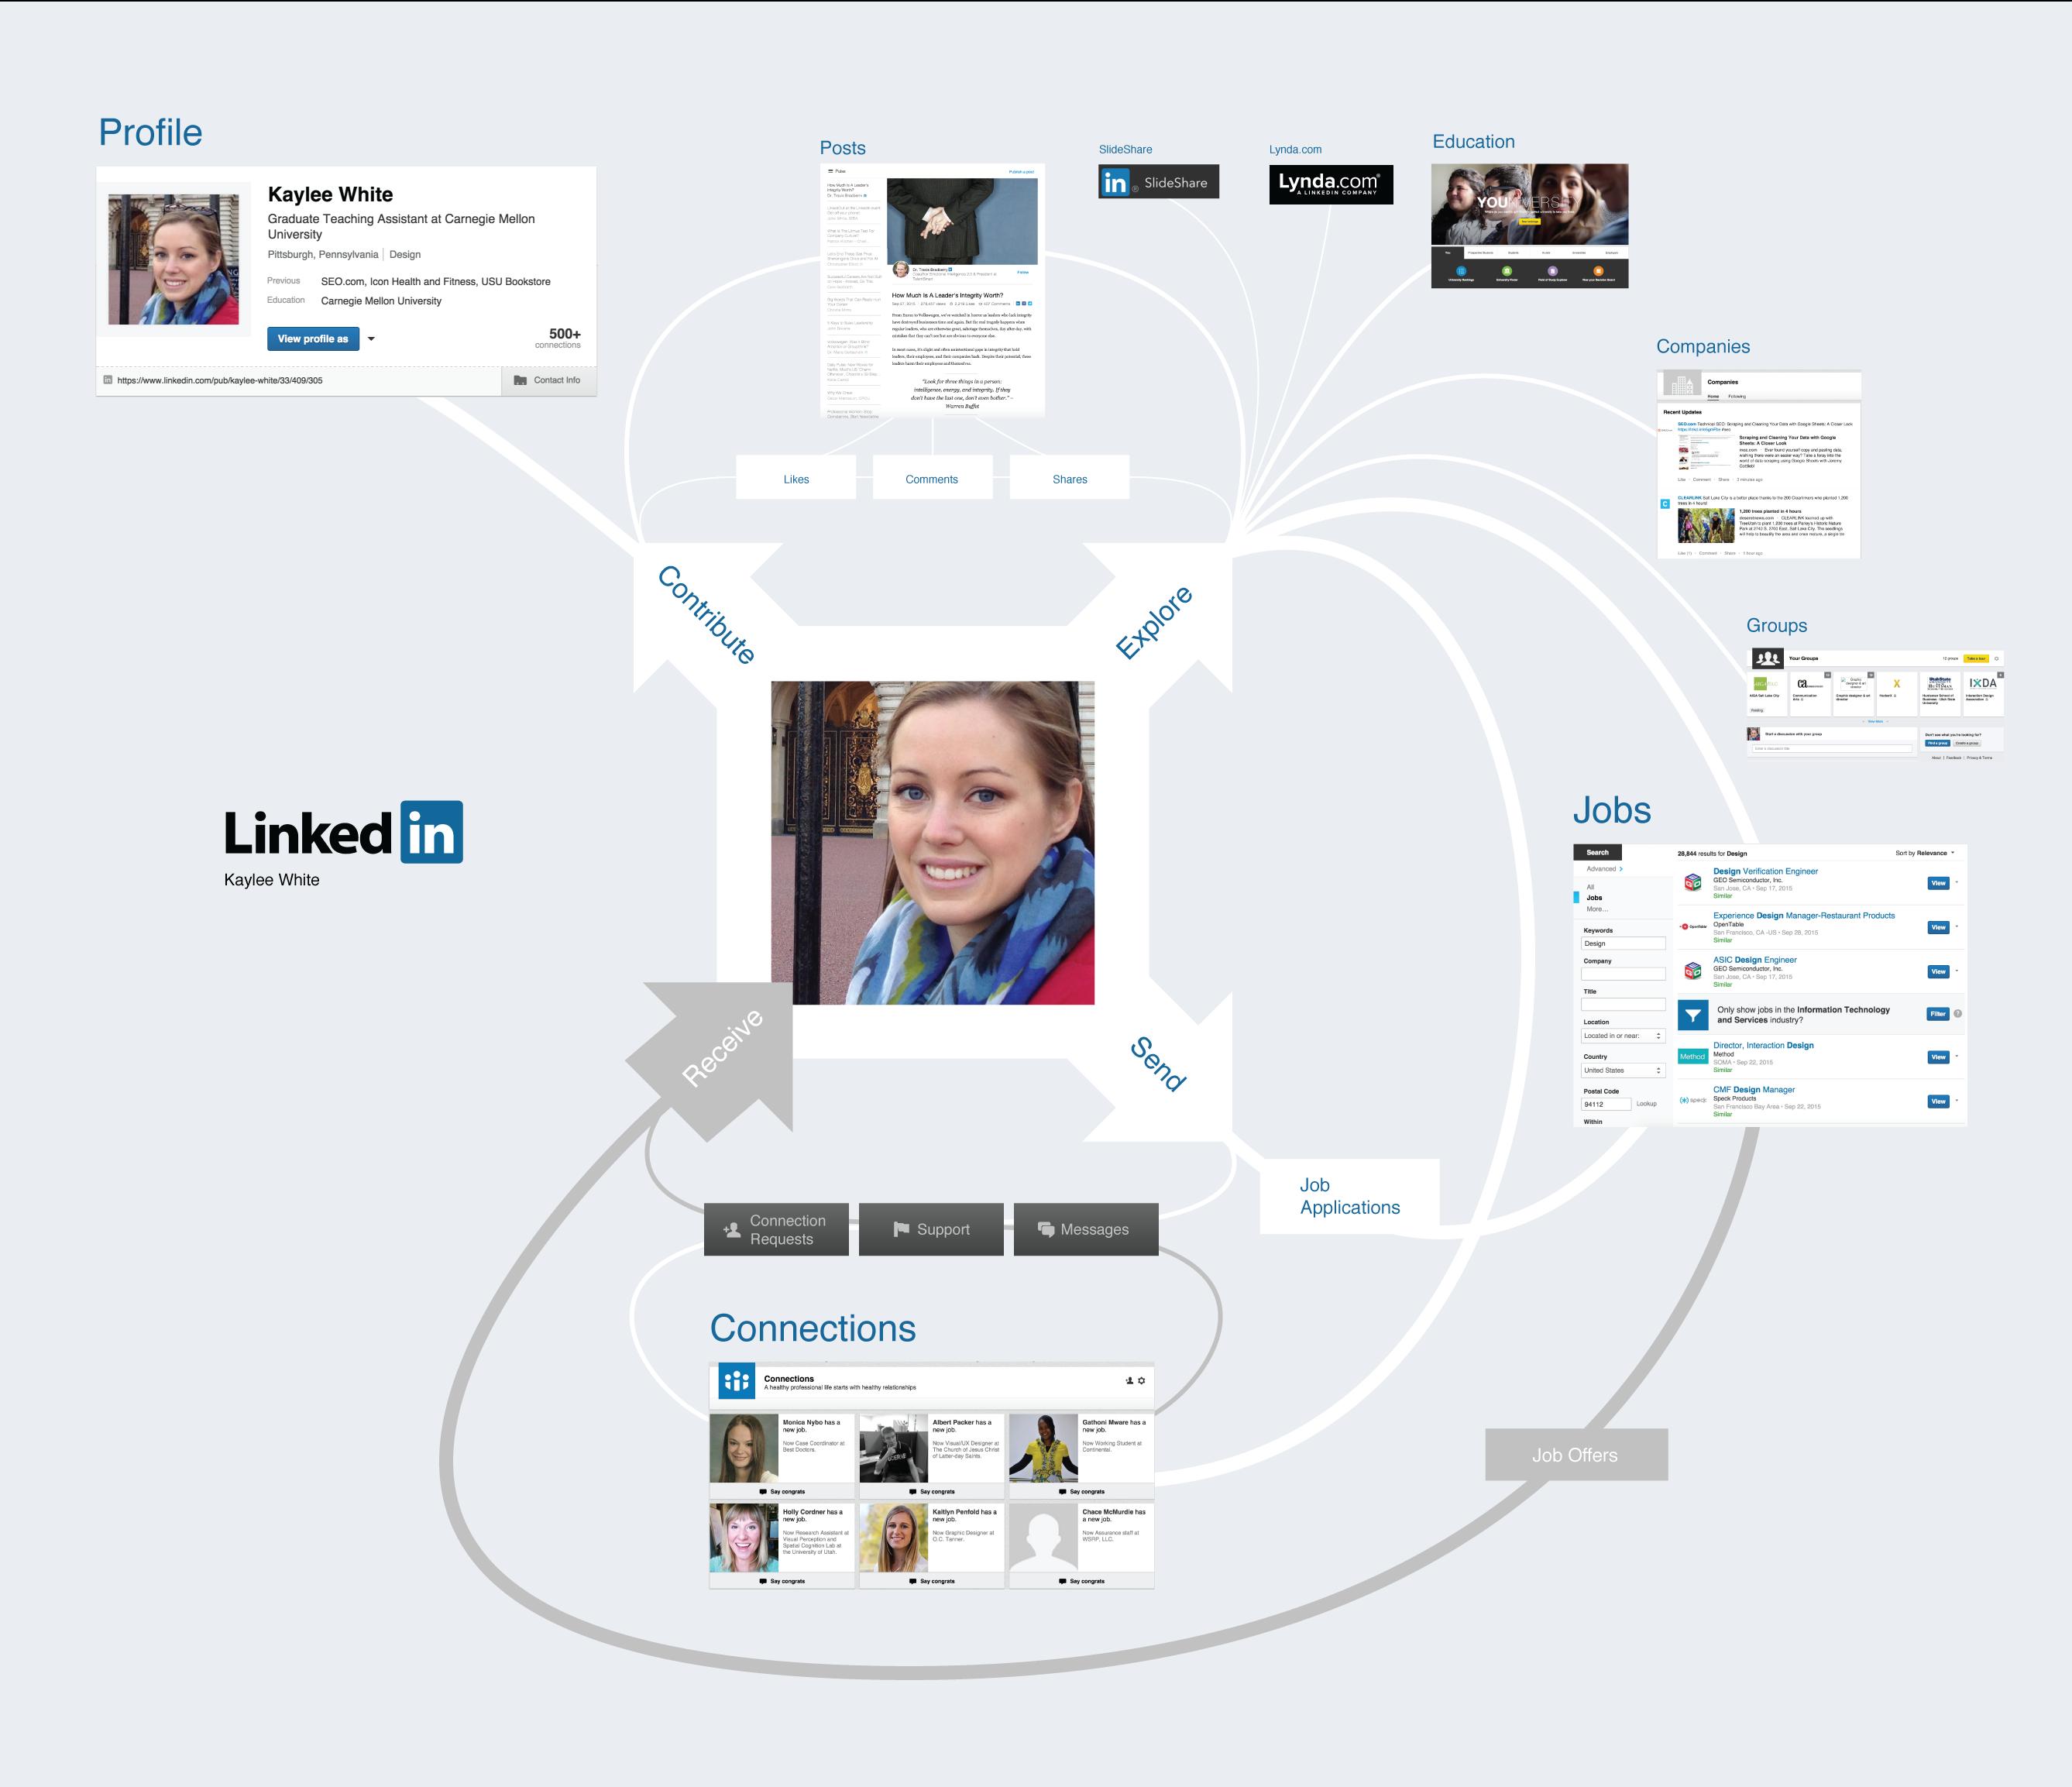 I explore LinkedIn from a conceptual perspective